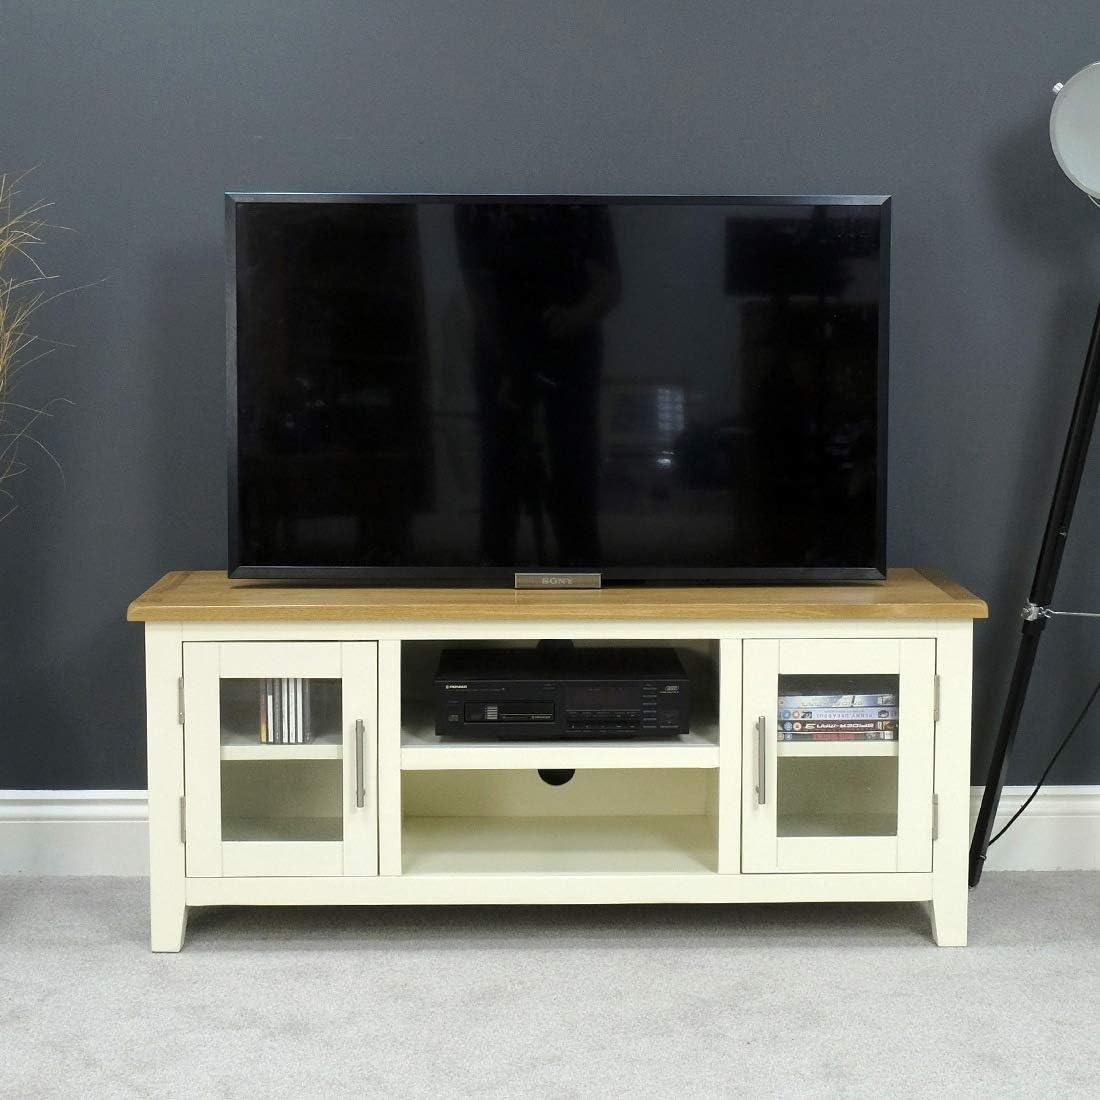 Nebraska roble pintado – crema grande TV Plasma DVD Video unidad soporte gabinete – Montado: Amazon.es: Hogar